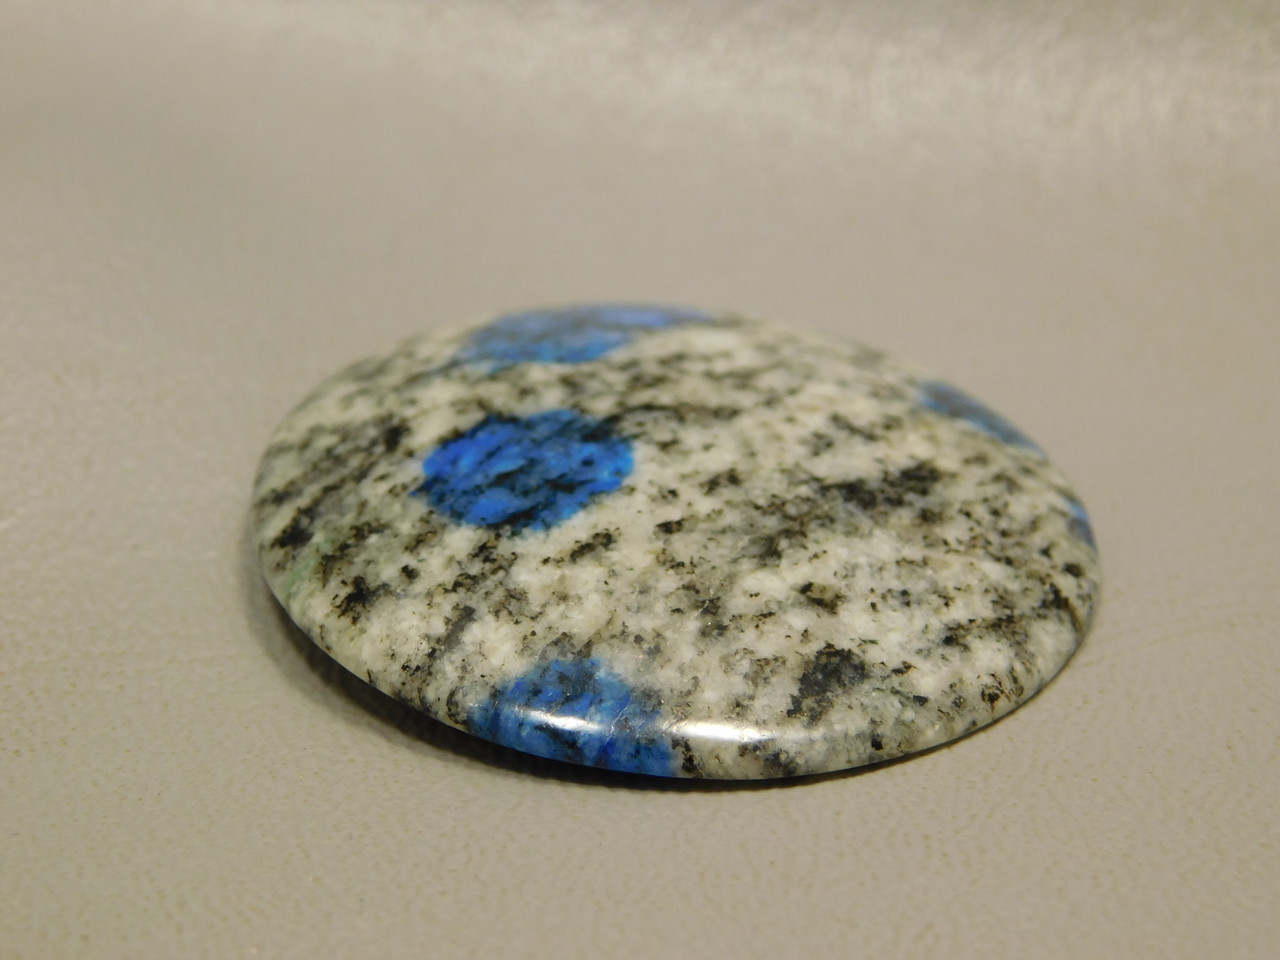 Cabochon K2 Azurite Granite 40 MM Round Semi Precious Gemstone 1